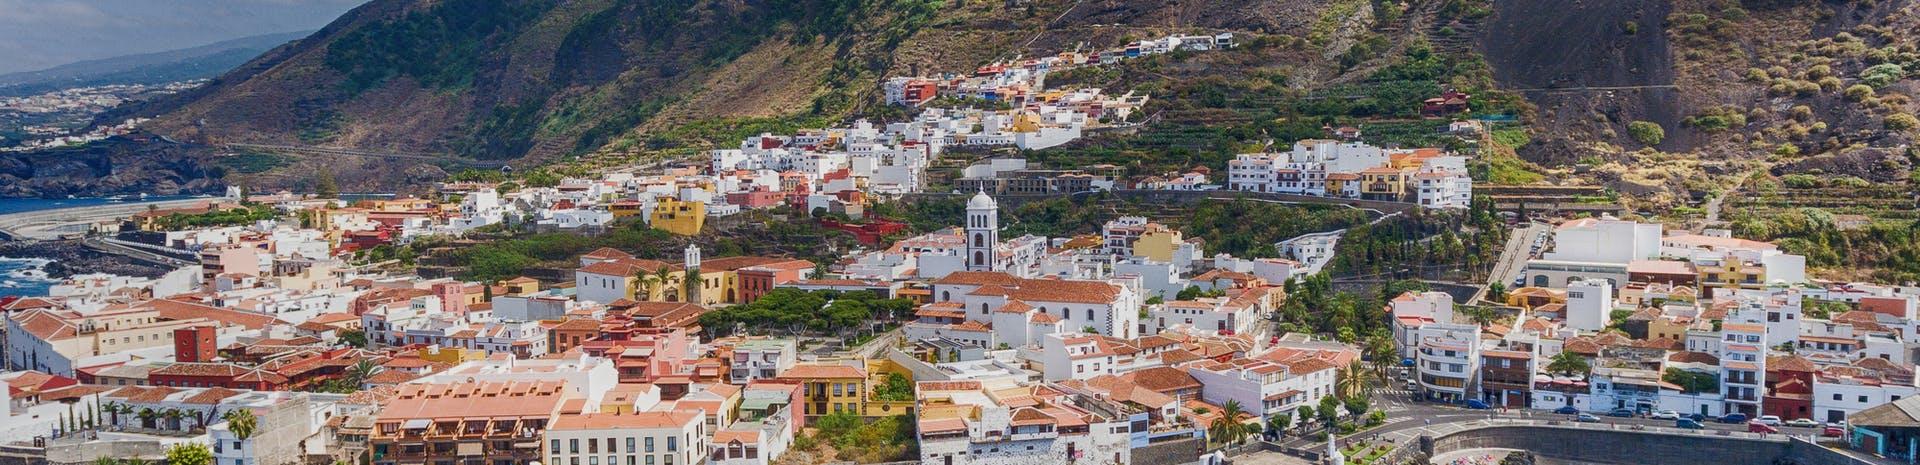 Picture of Tenerife